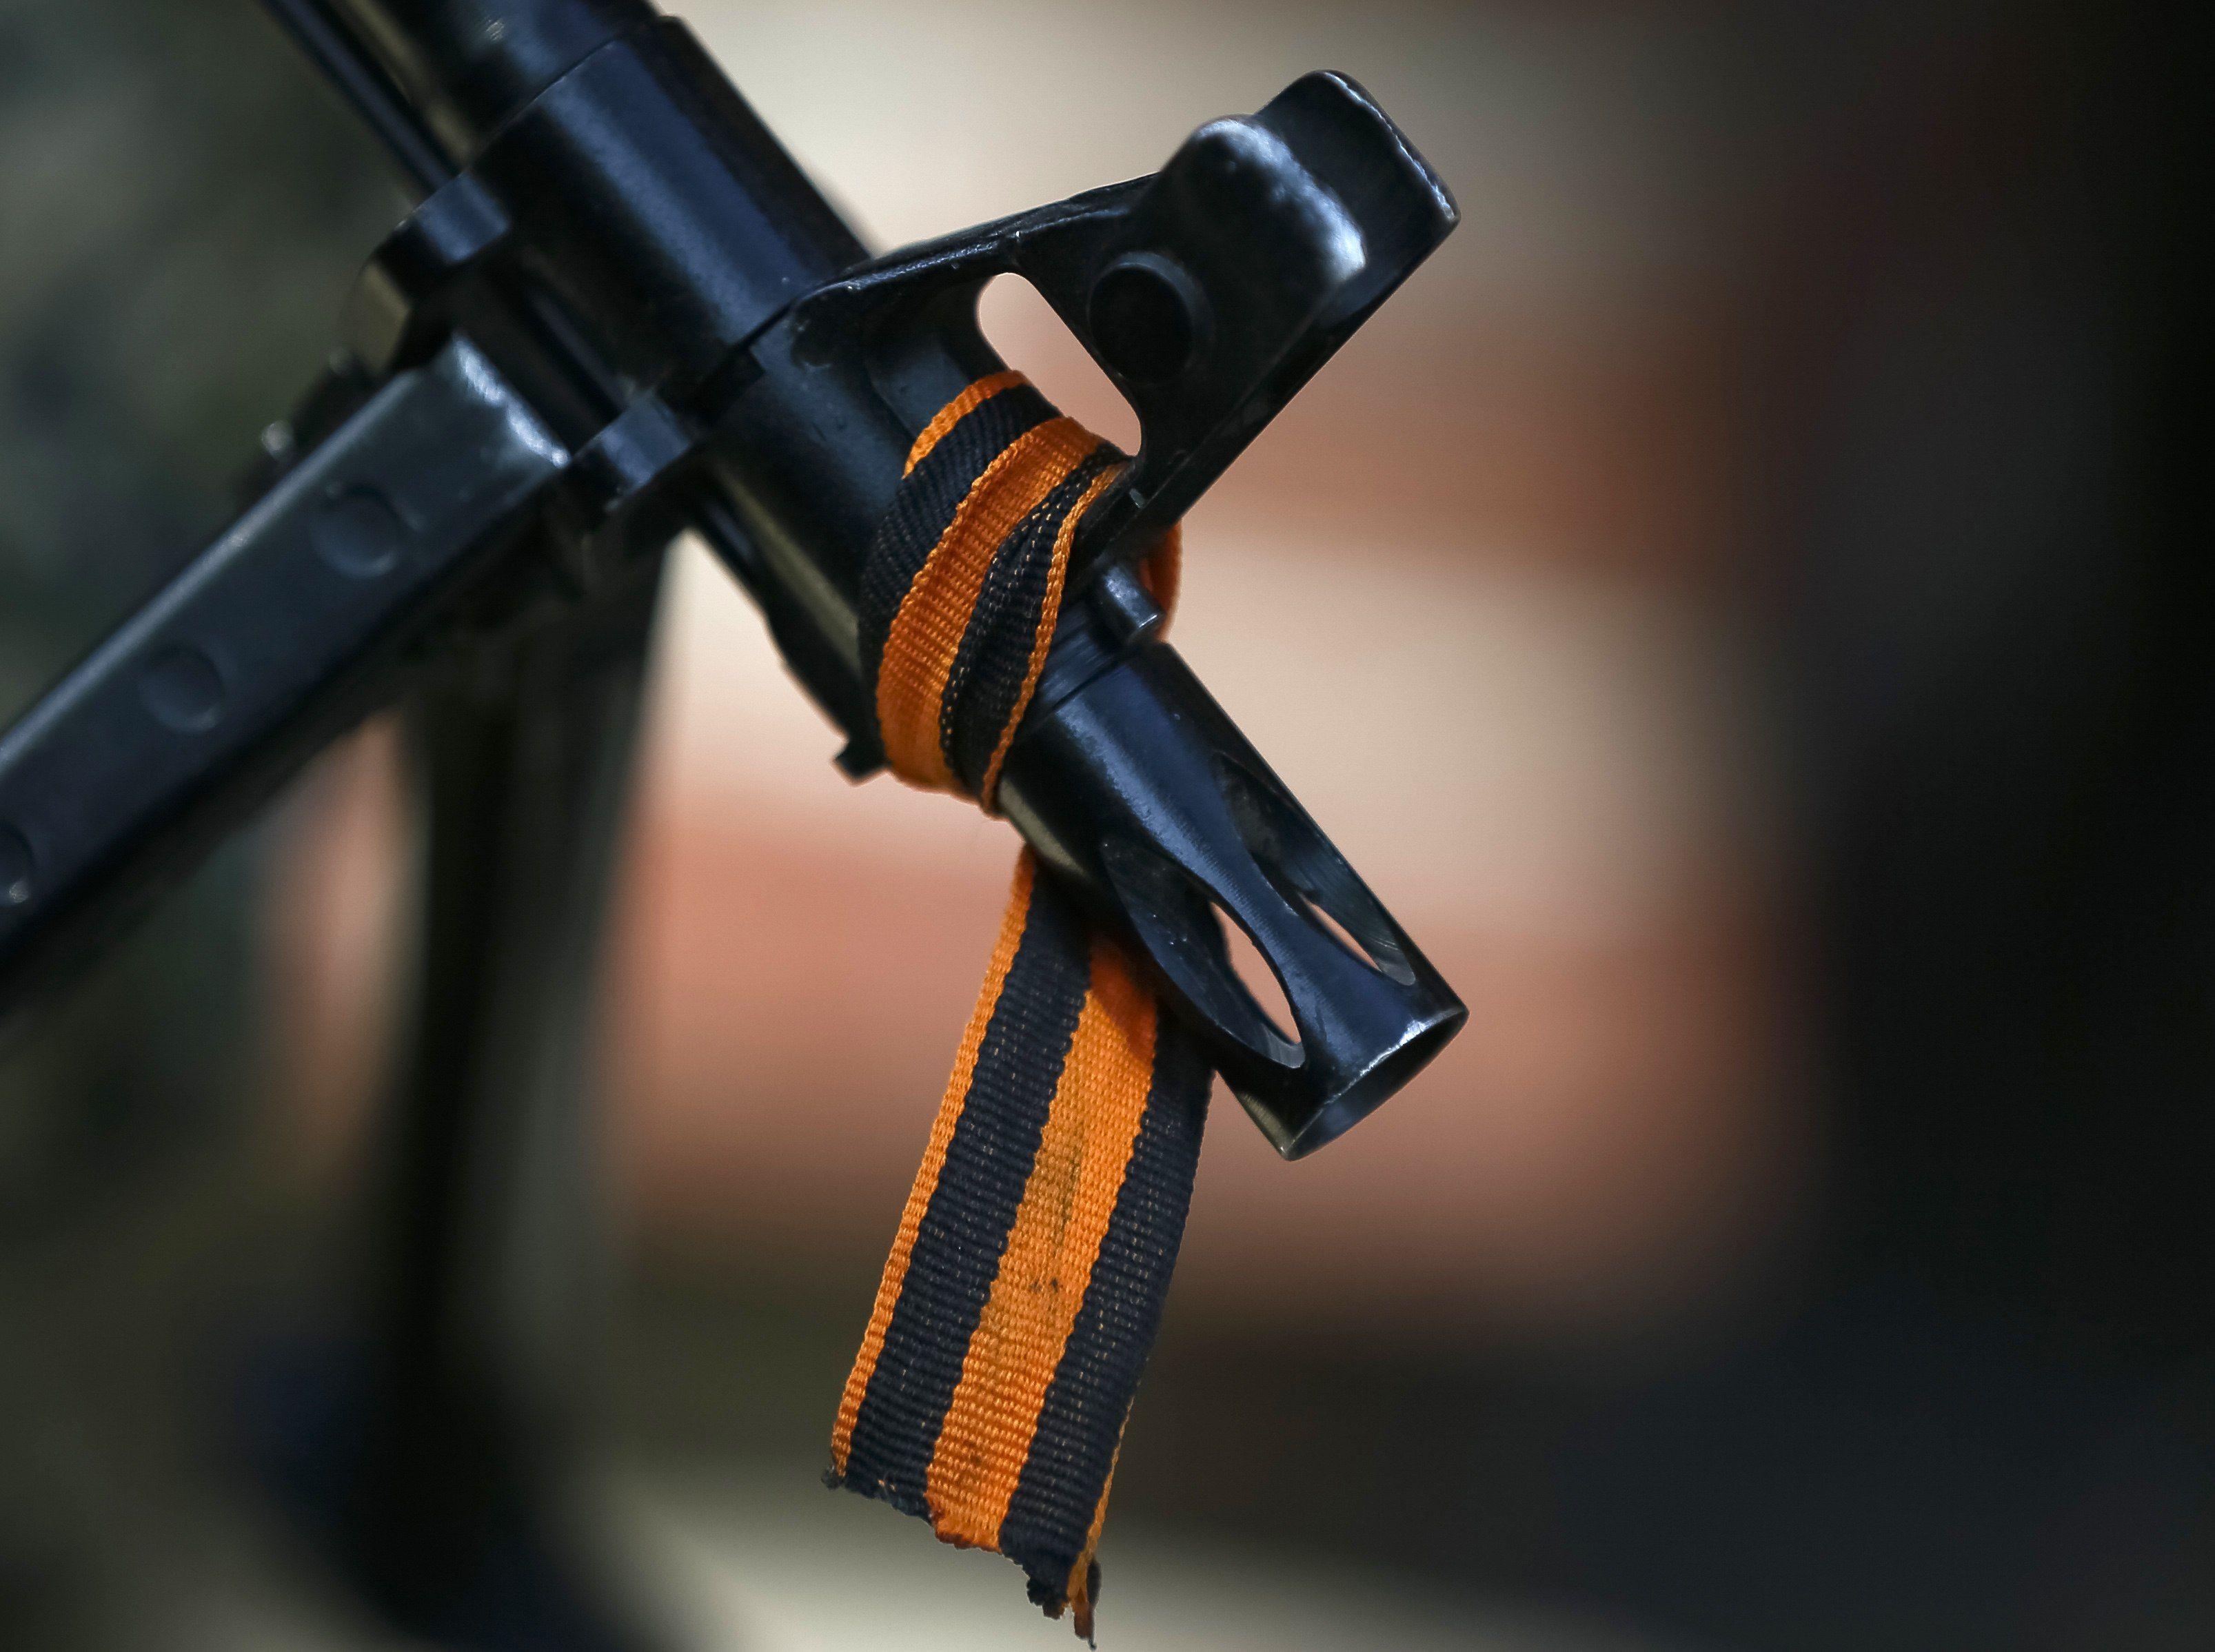 Автомат боевика, иллюстрация